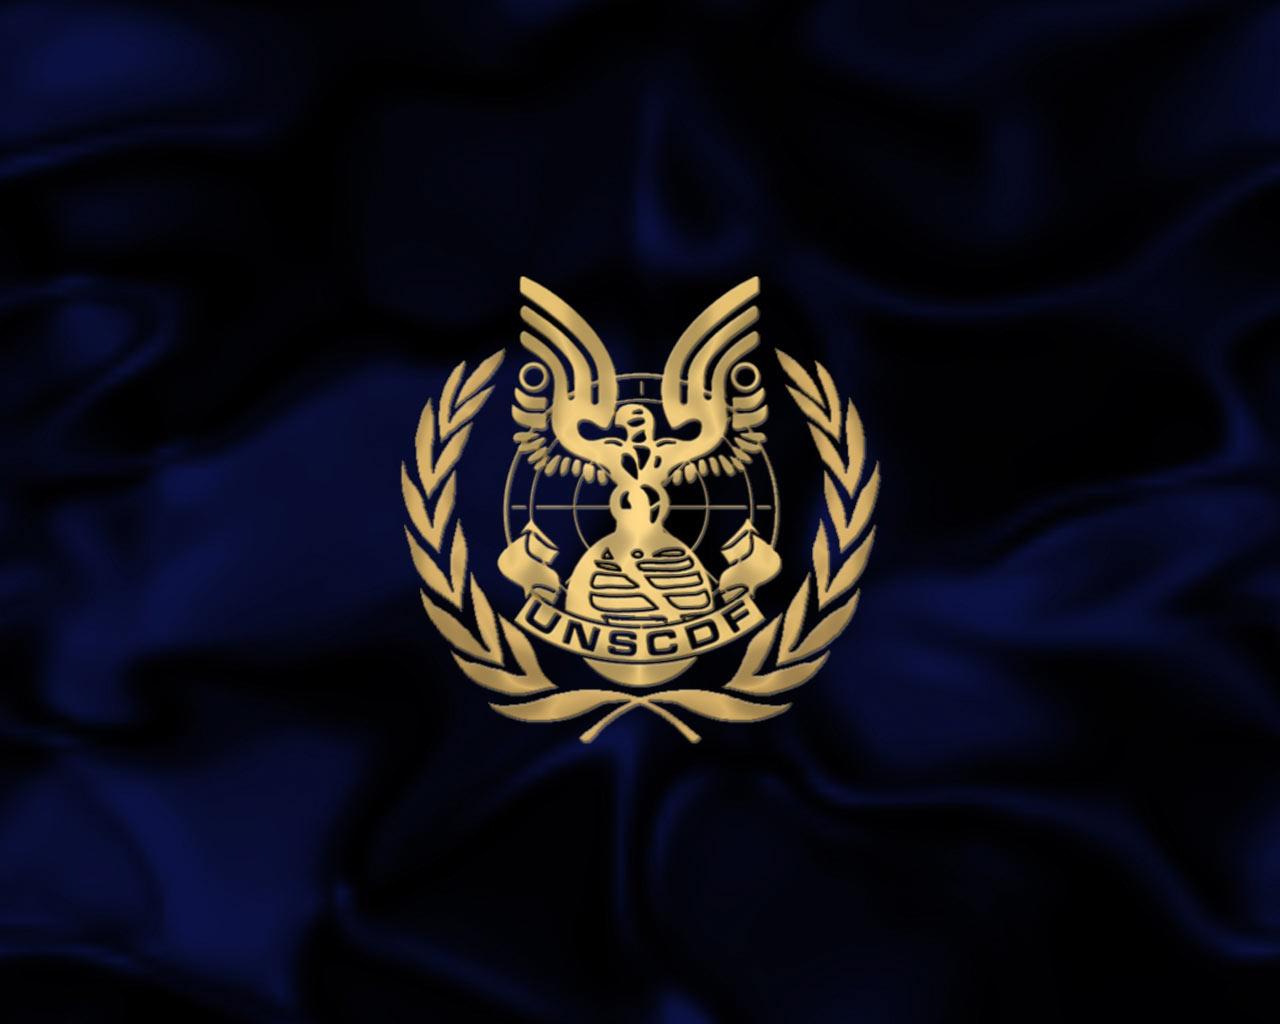 Unsc Unit List Feature Dawn Of Halo Mod For Dawn Of War Mod Db